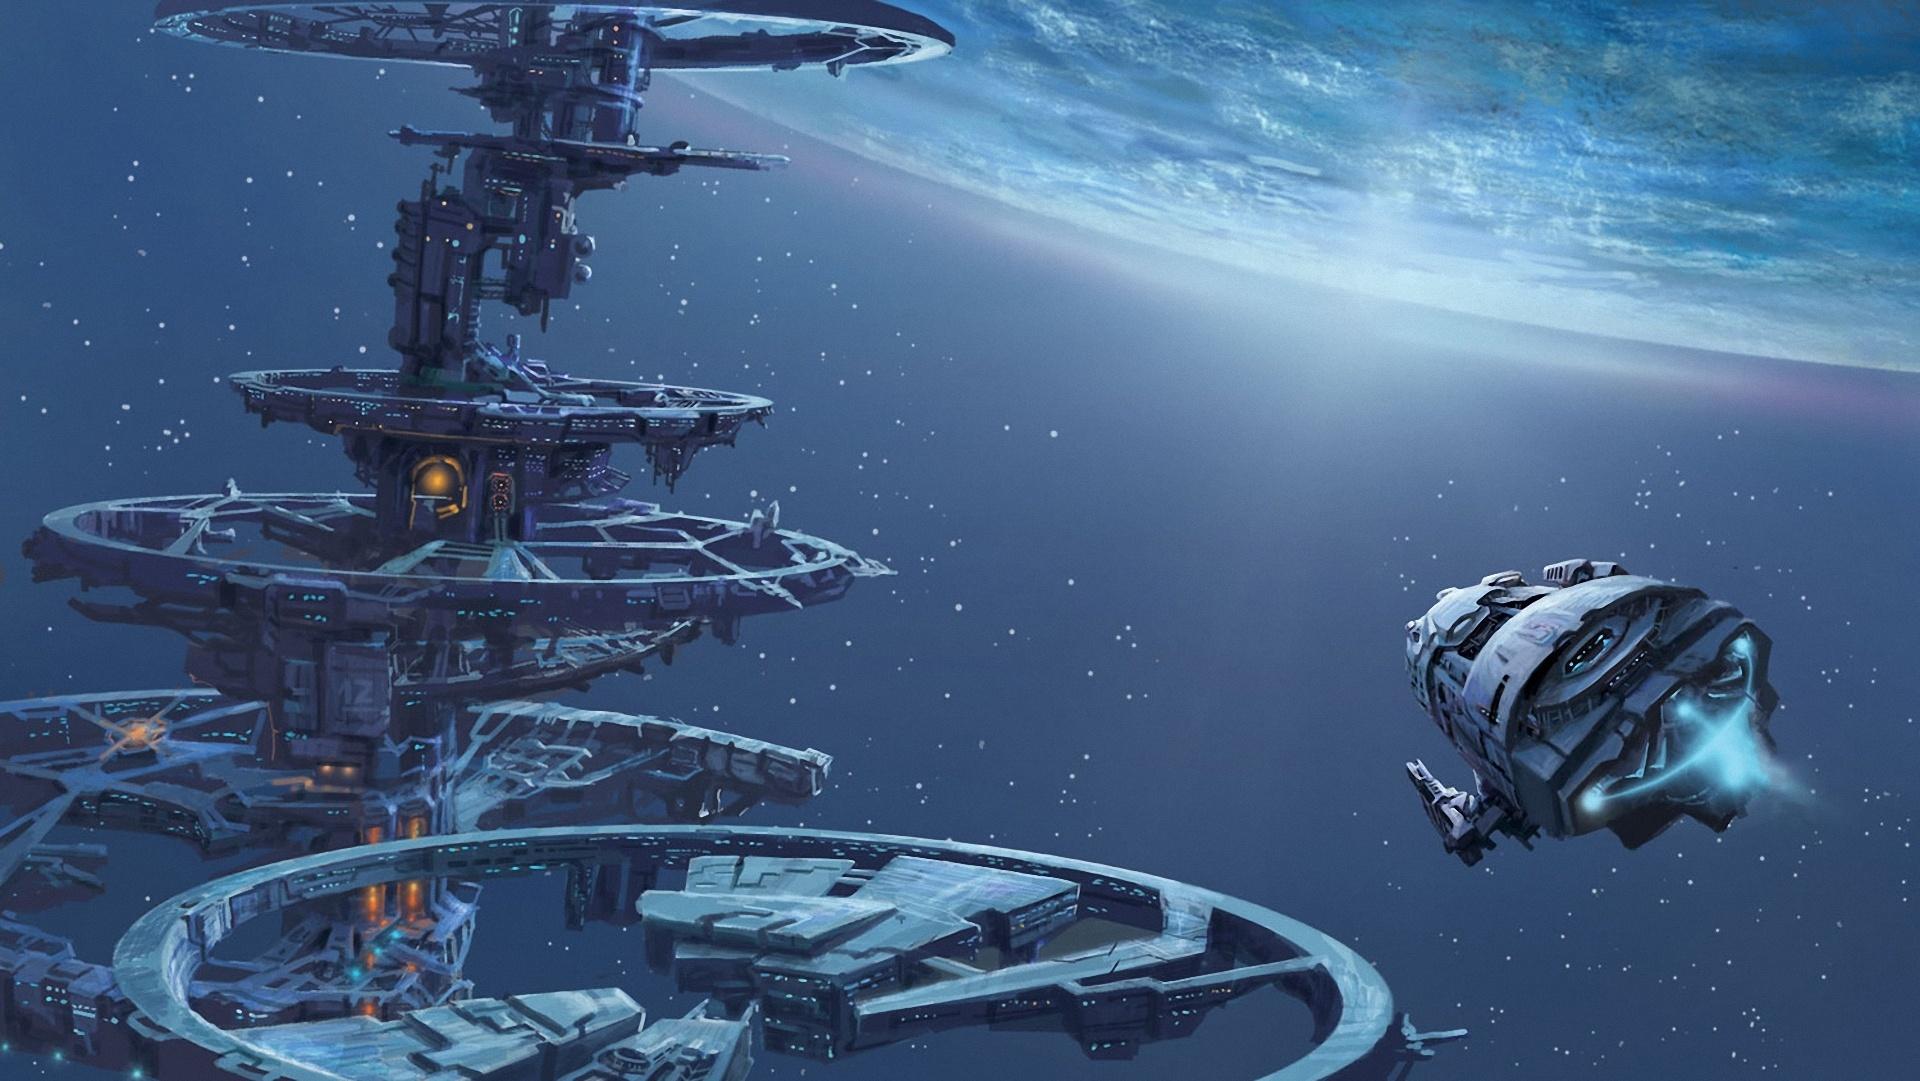 Space planet ship art station wallpaper | 1920x1081 ...